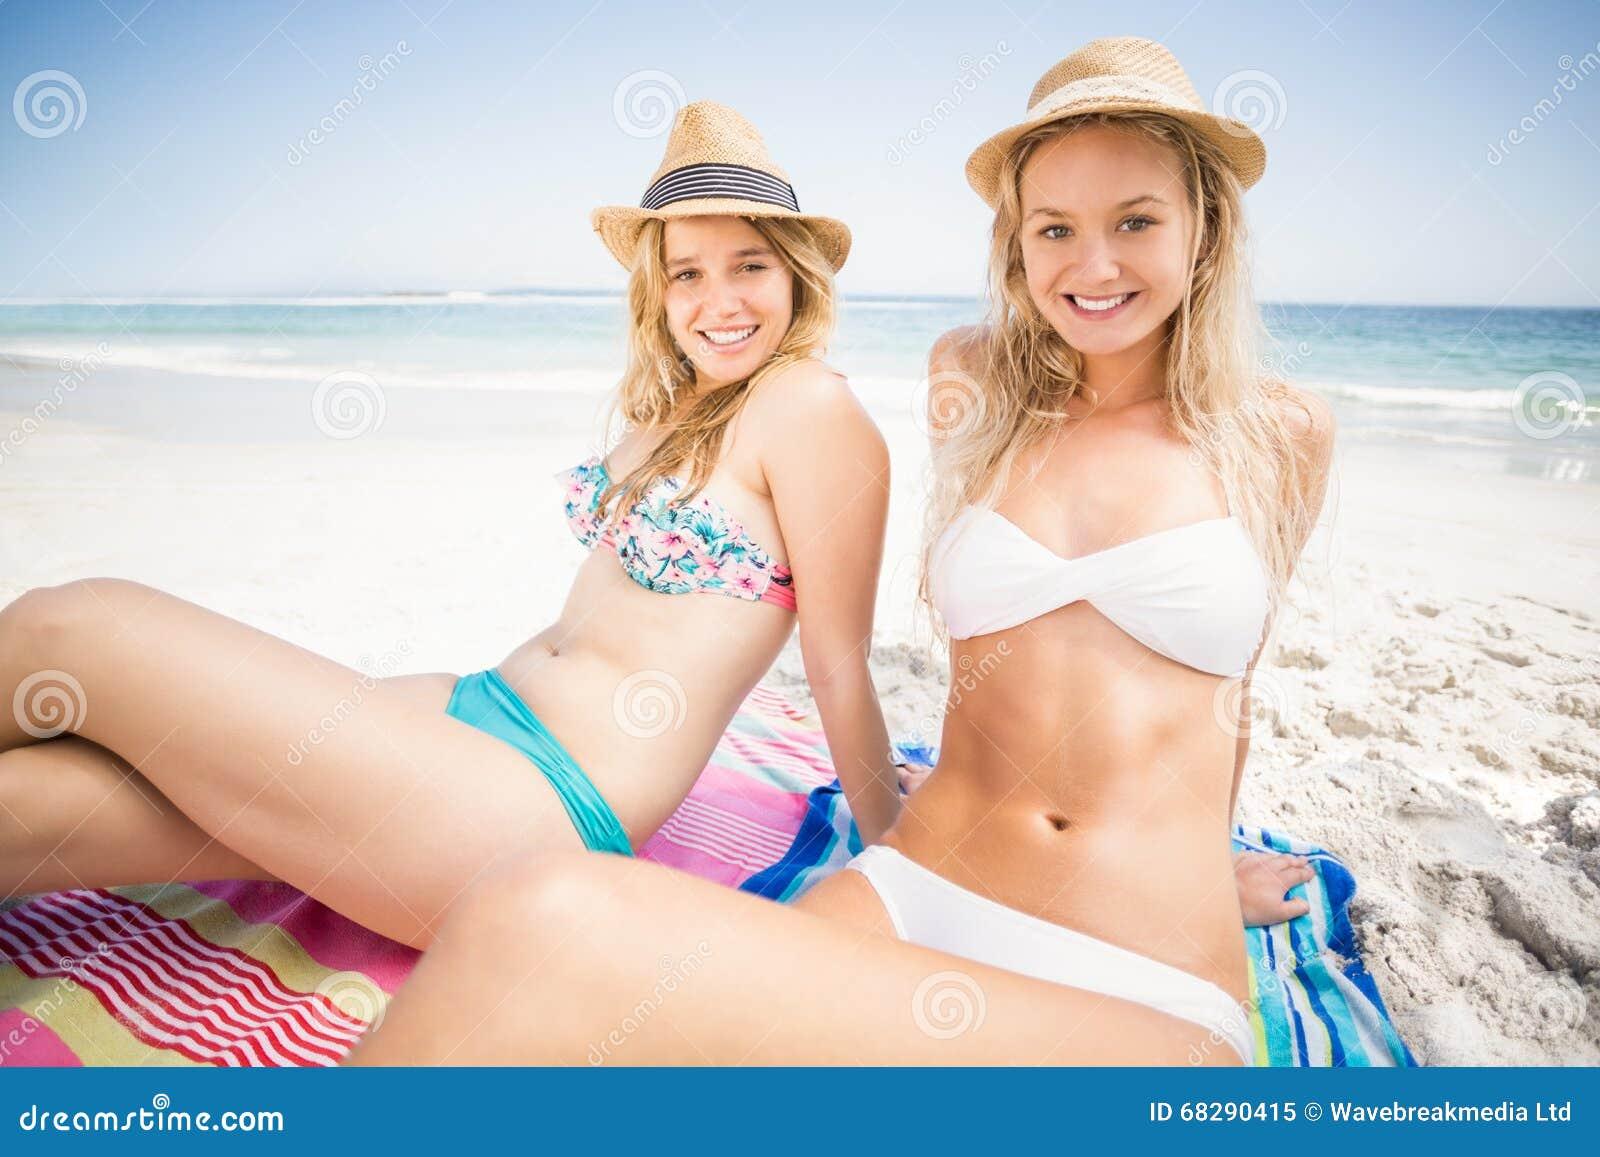 sexchat nl mooie vrouwen bikini